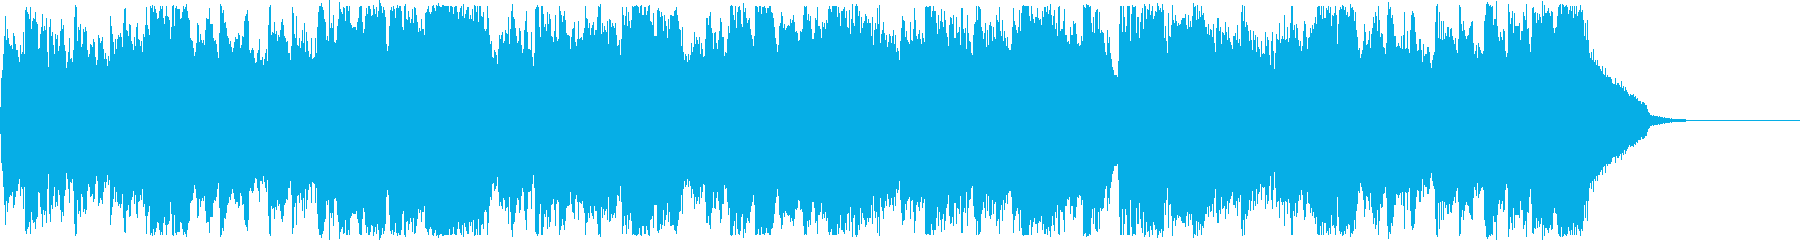 CM・爽やかな夏の海・男性ボーカルレゲエの再生済みの波形